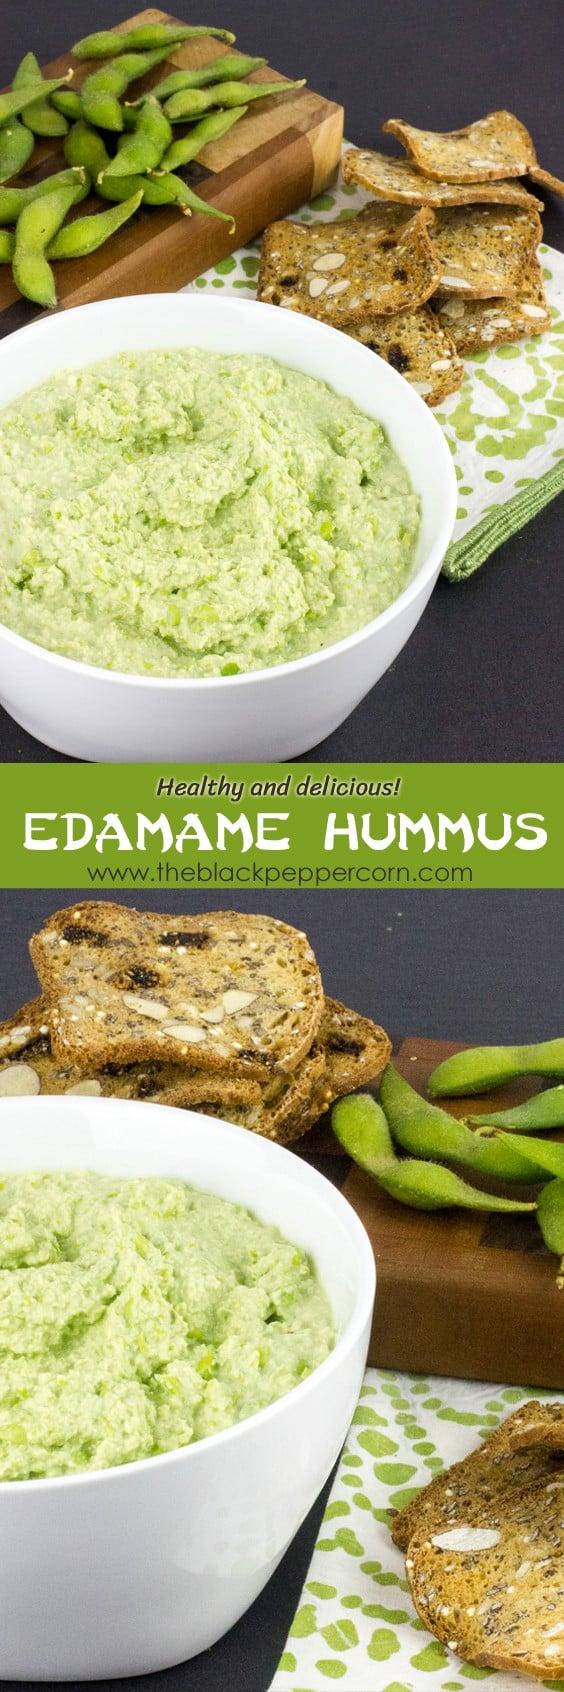 Edamame Hummus Dip Recipe How to Make